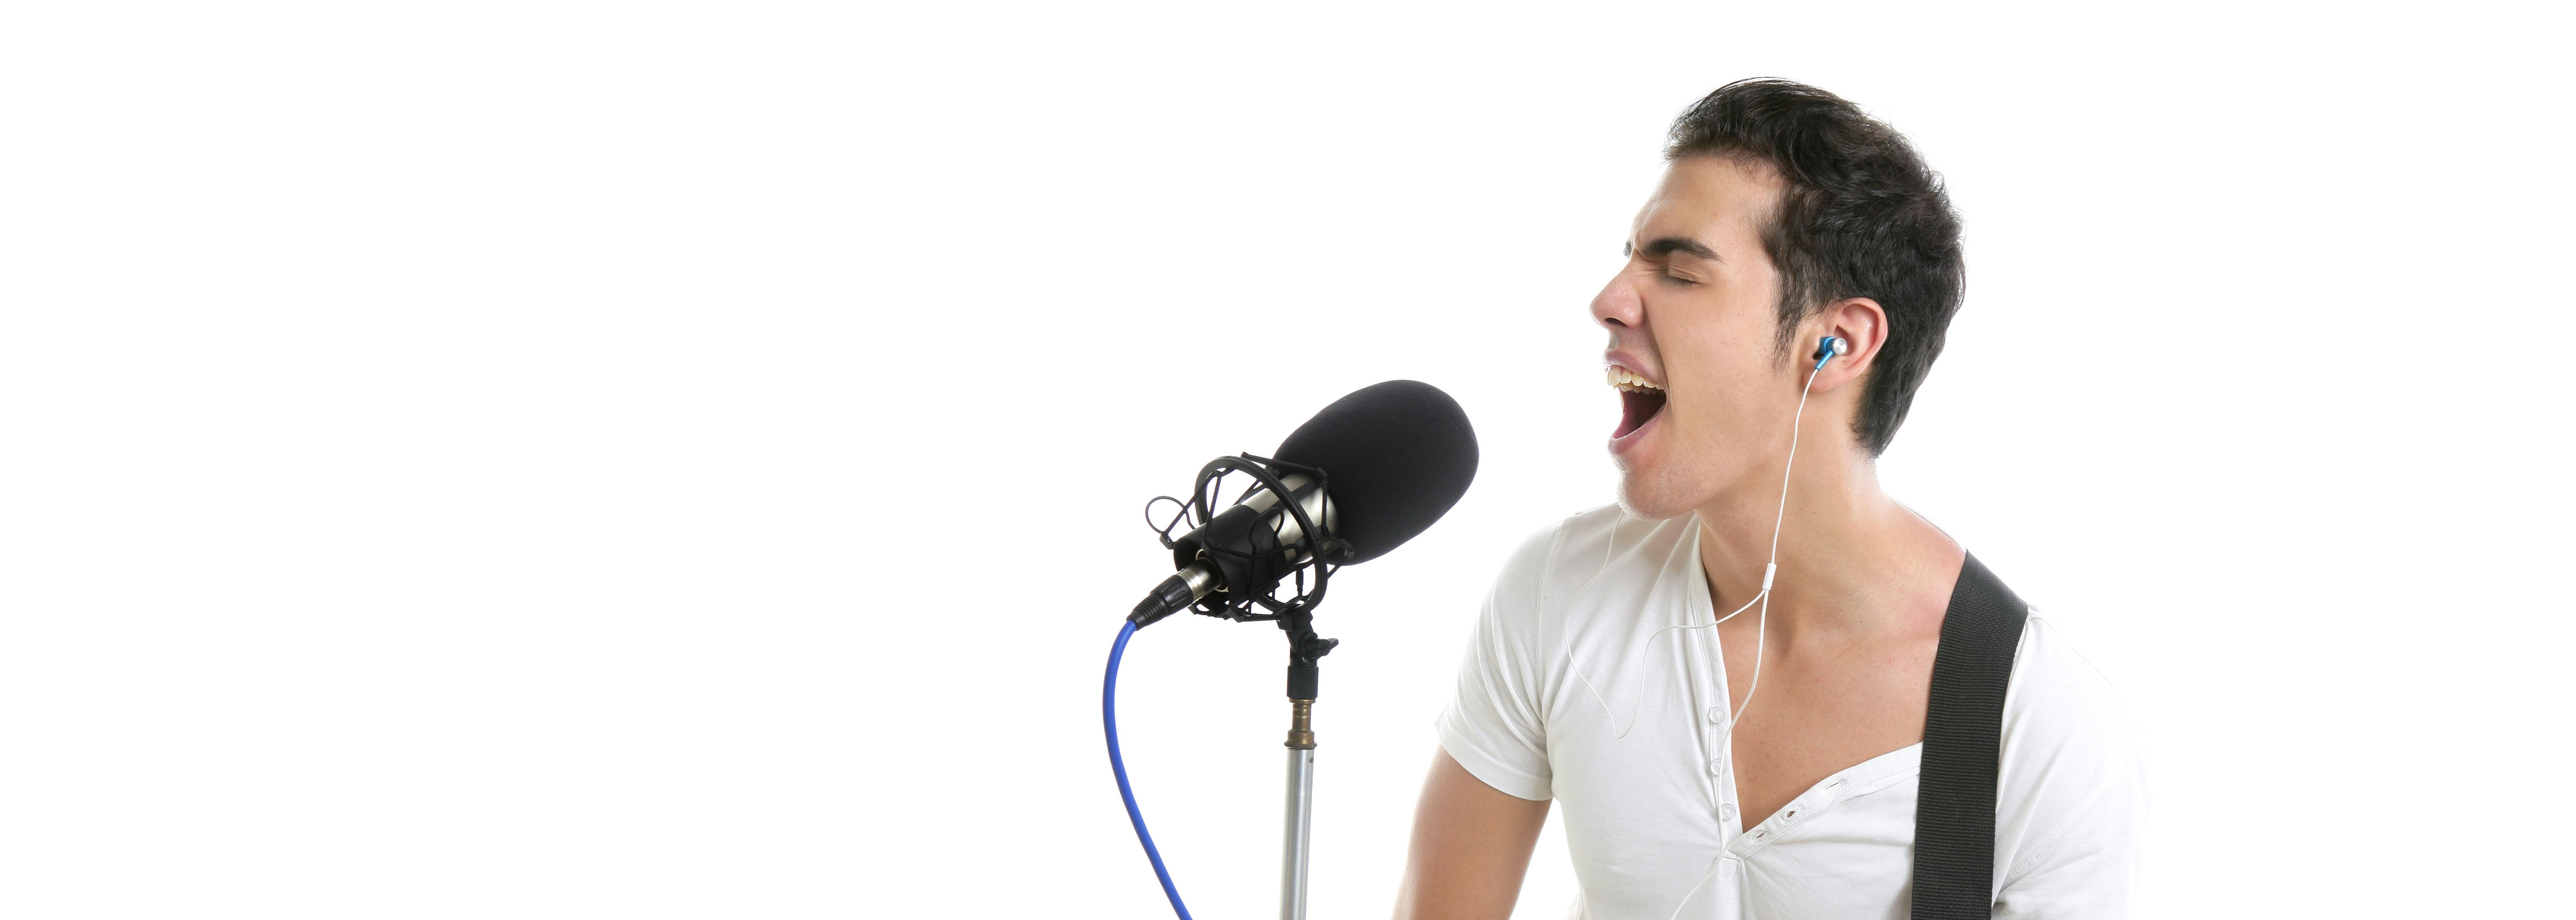 Singing Teen Crop 3